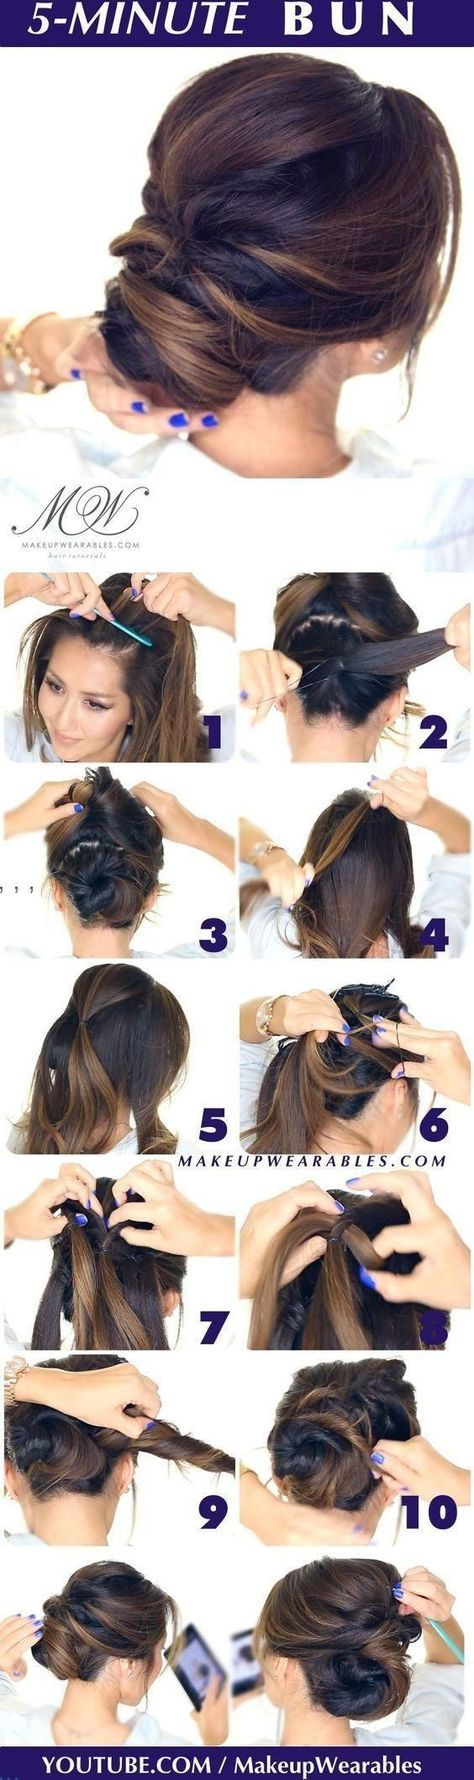 best frisuren images on pinterest hair makeup hairstyle ideas